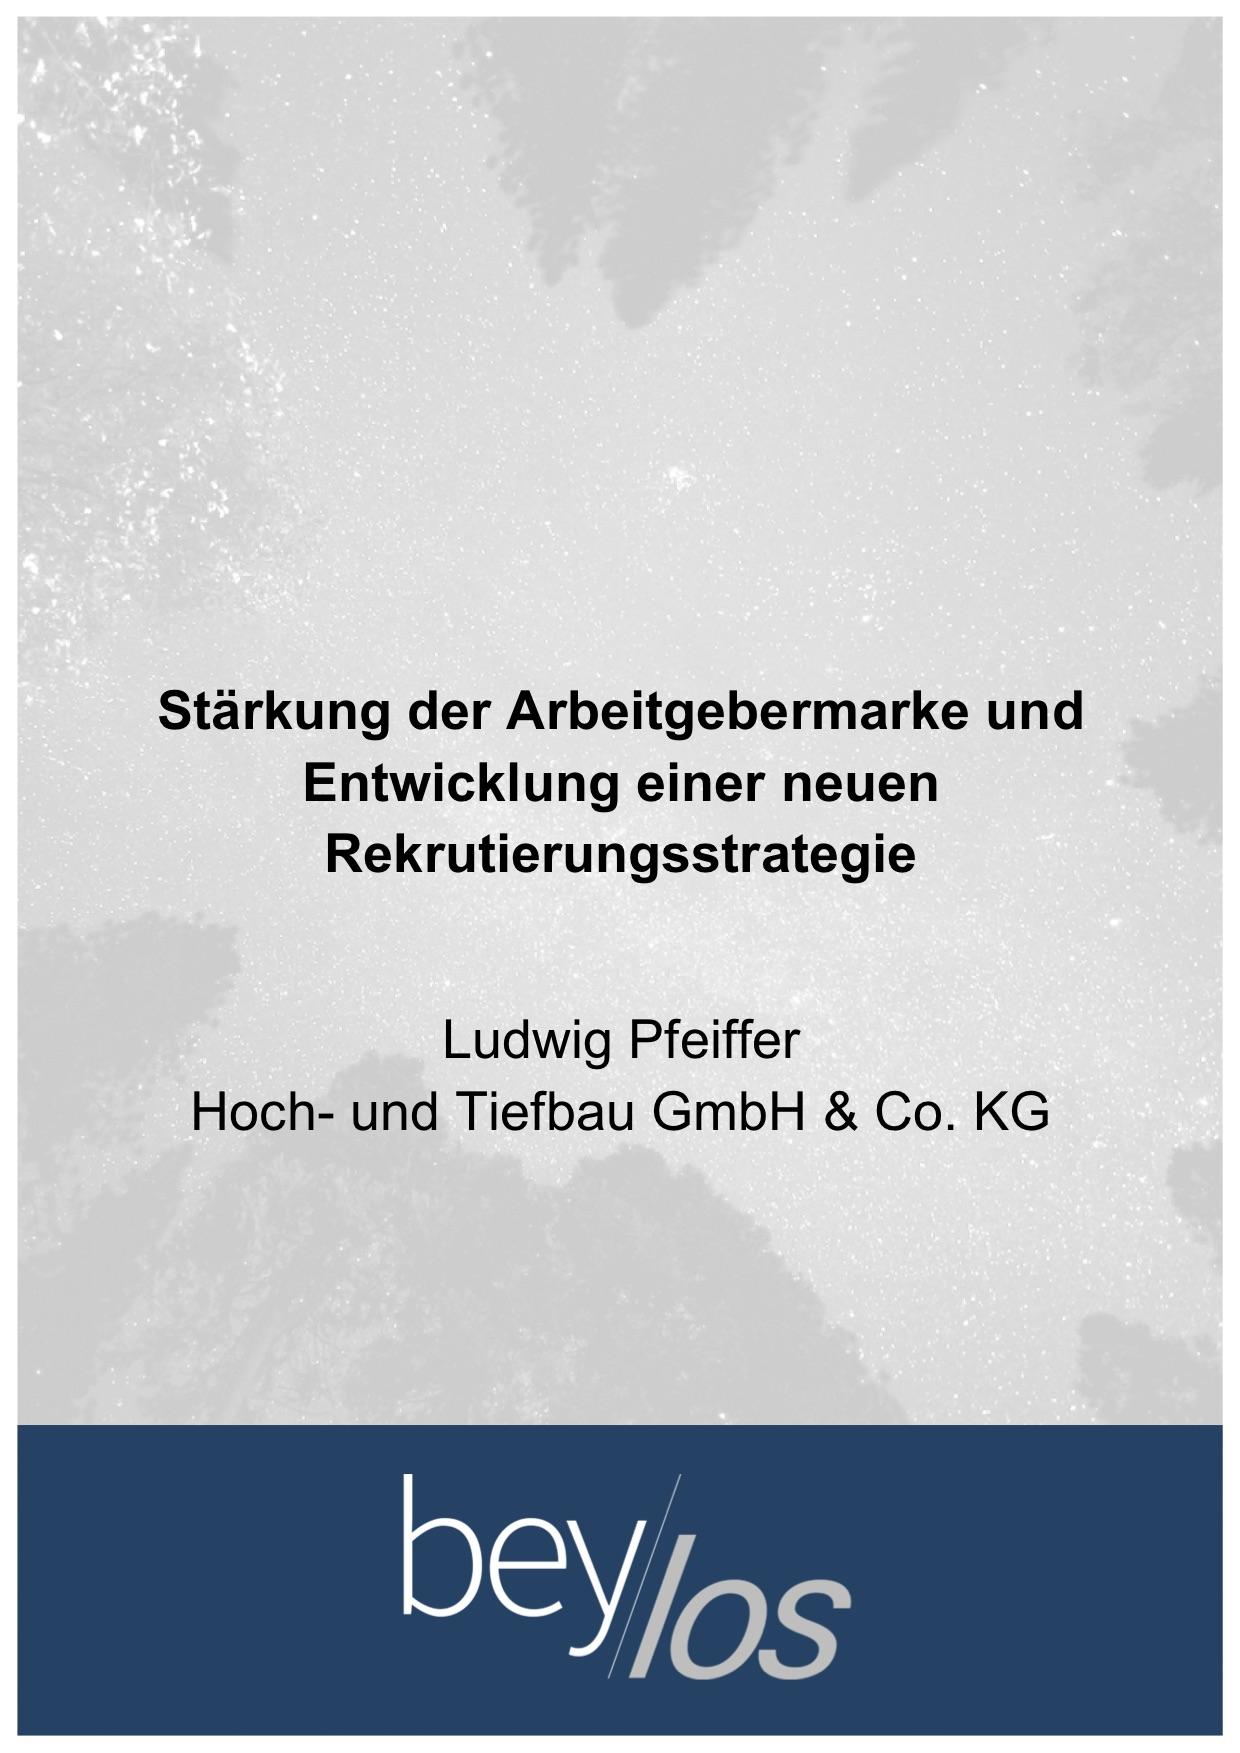 Ludwig Pfeiffer Hoch- und Tiefbau GmbH & Co. KG Website